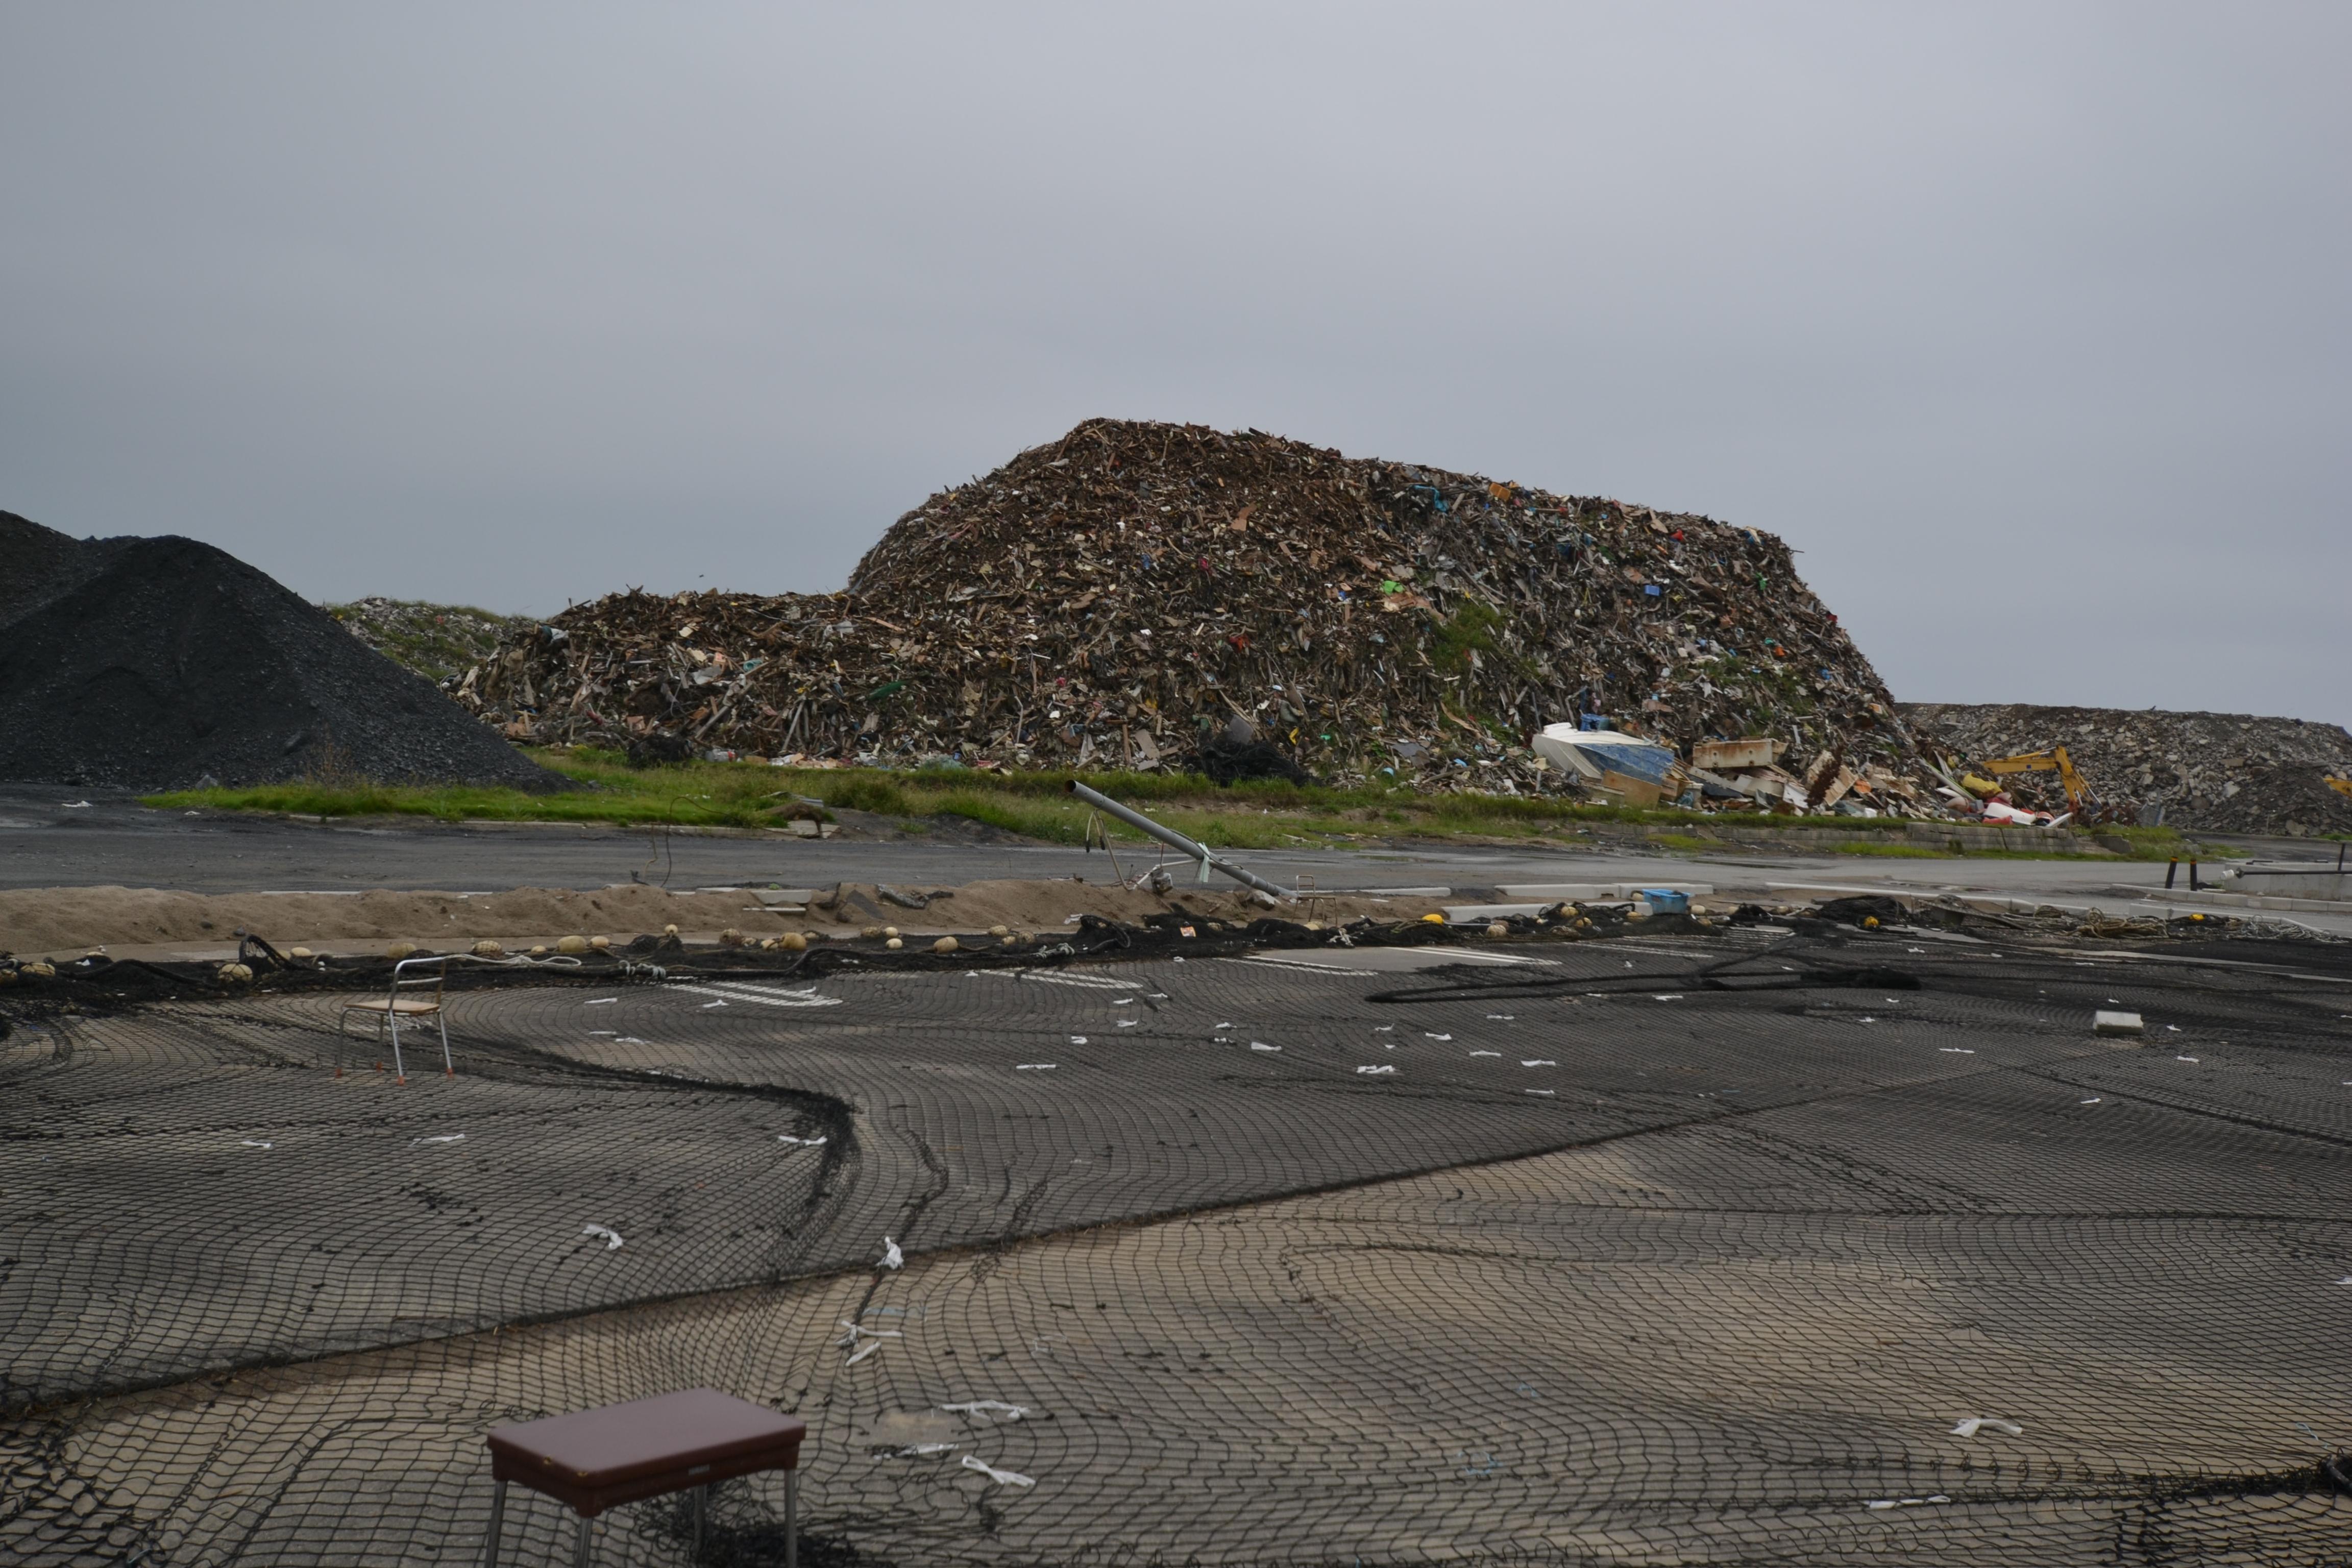 watari mountain of debris and nets.JPG